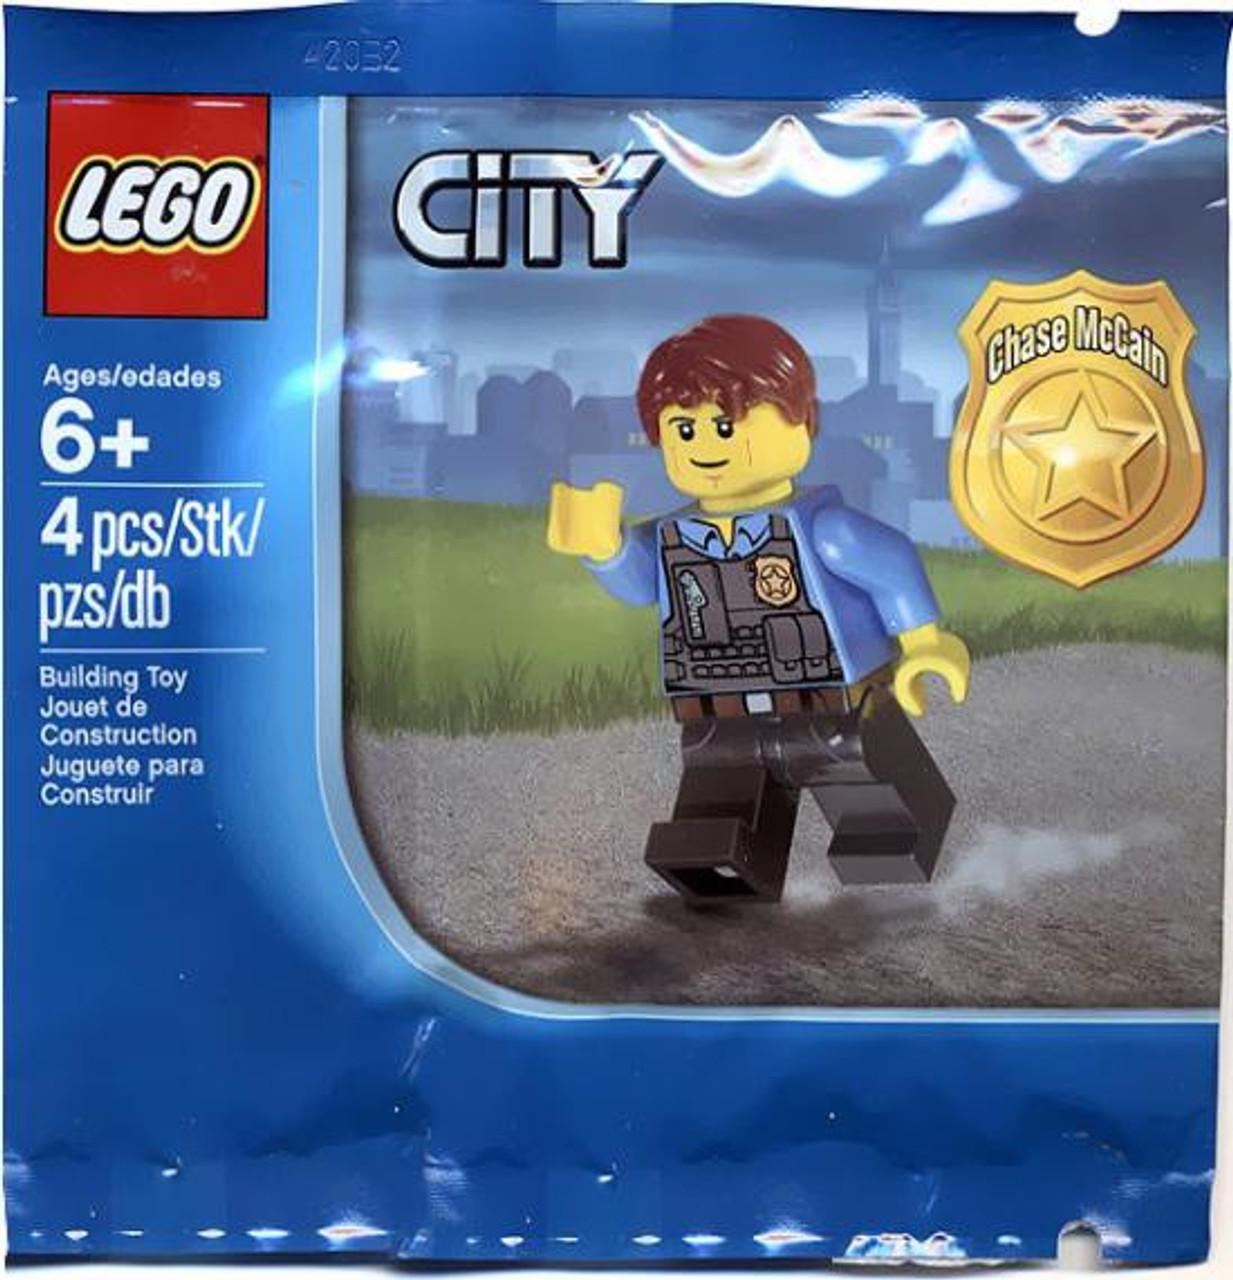 LEGO City Chase McCain Exclusive Mini Set 5000281 Bagged - ToyWiz